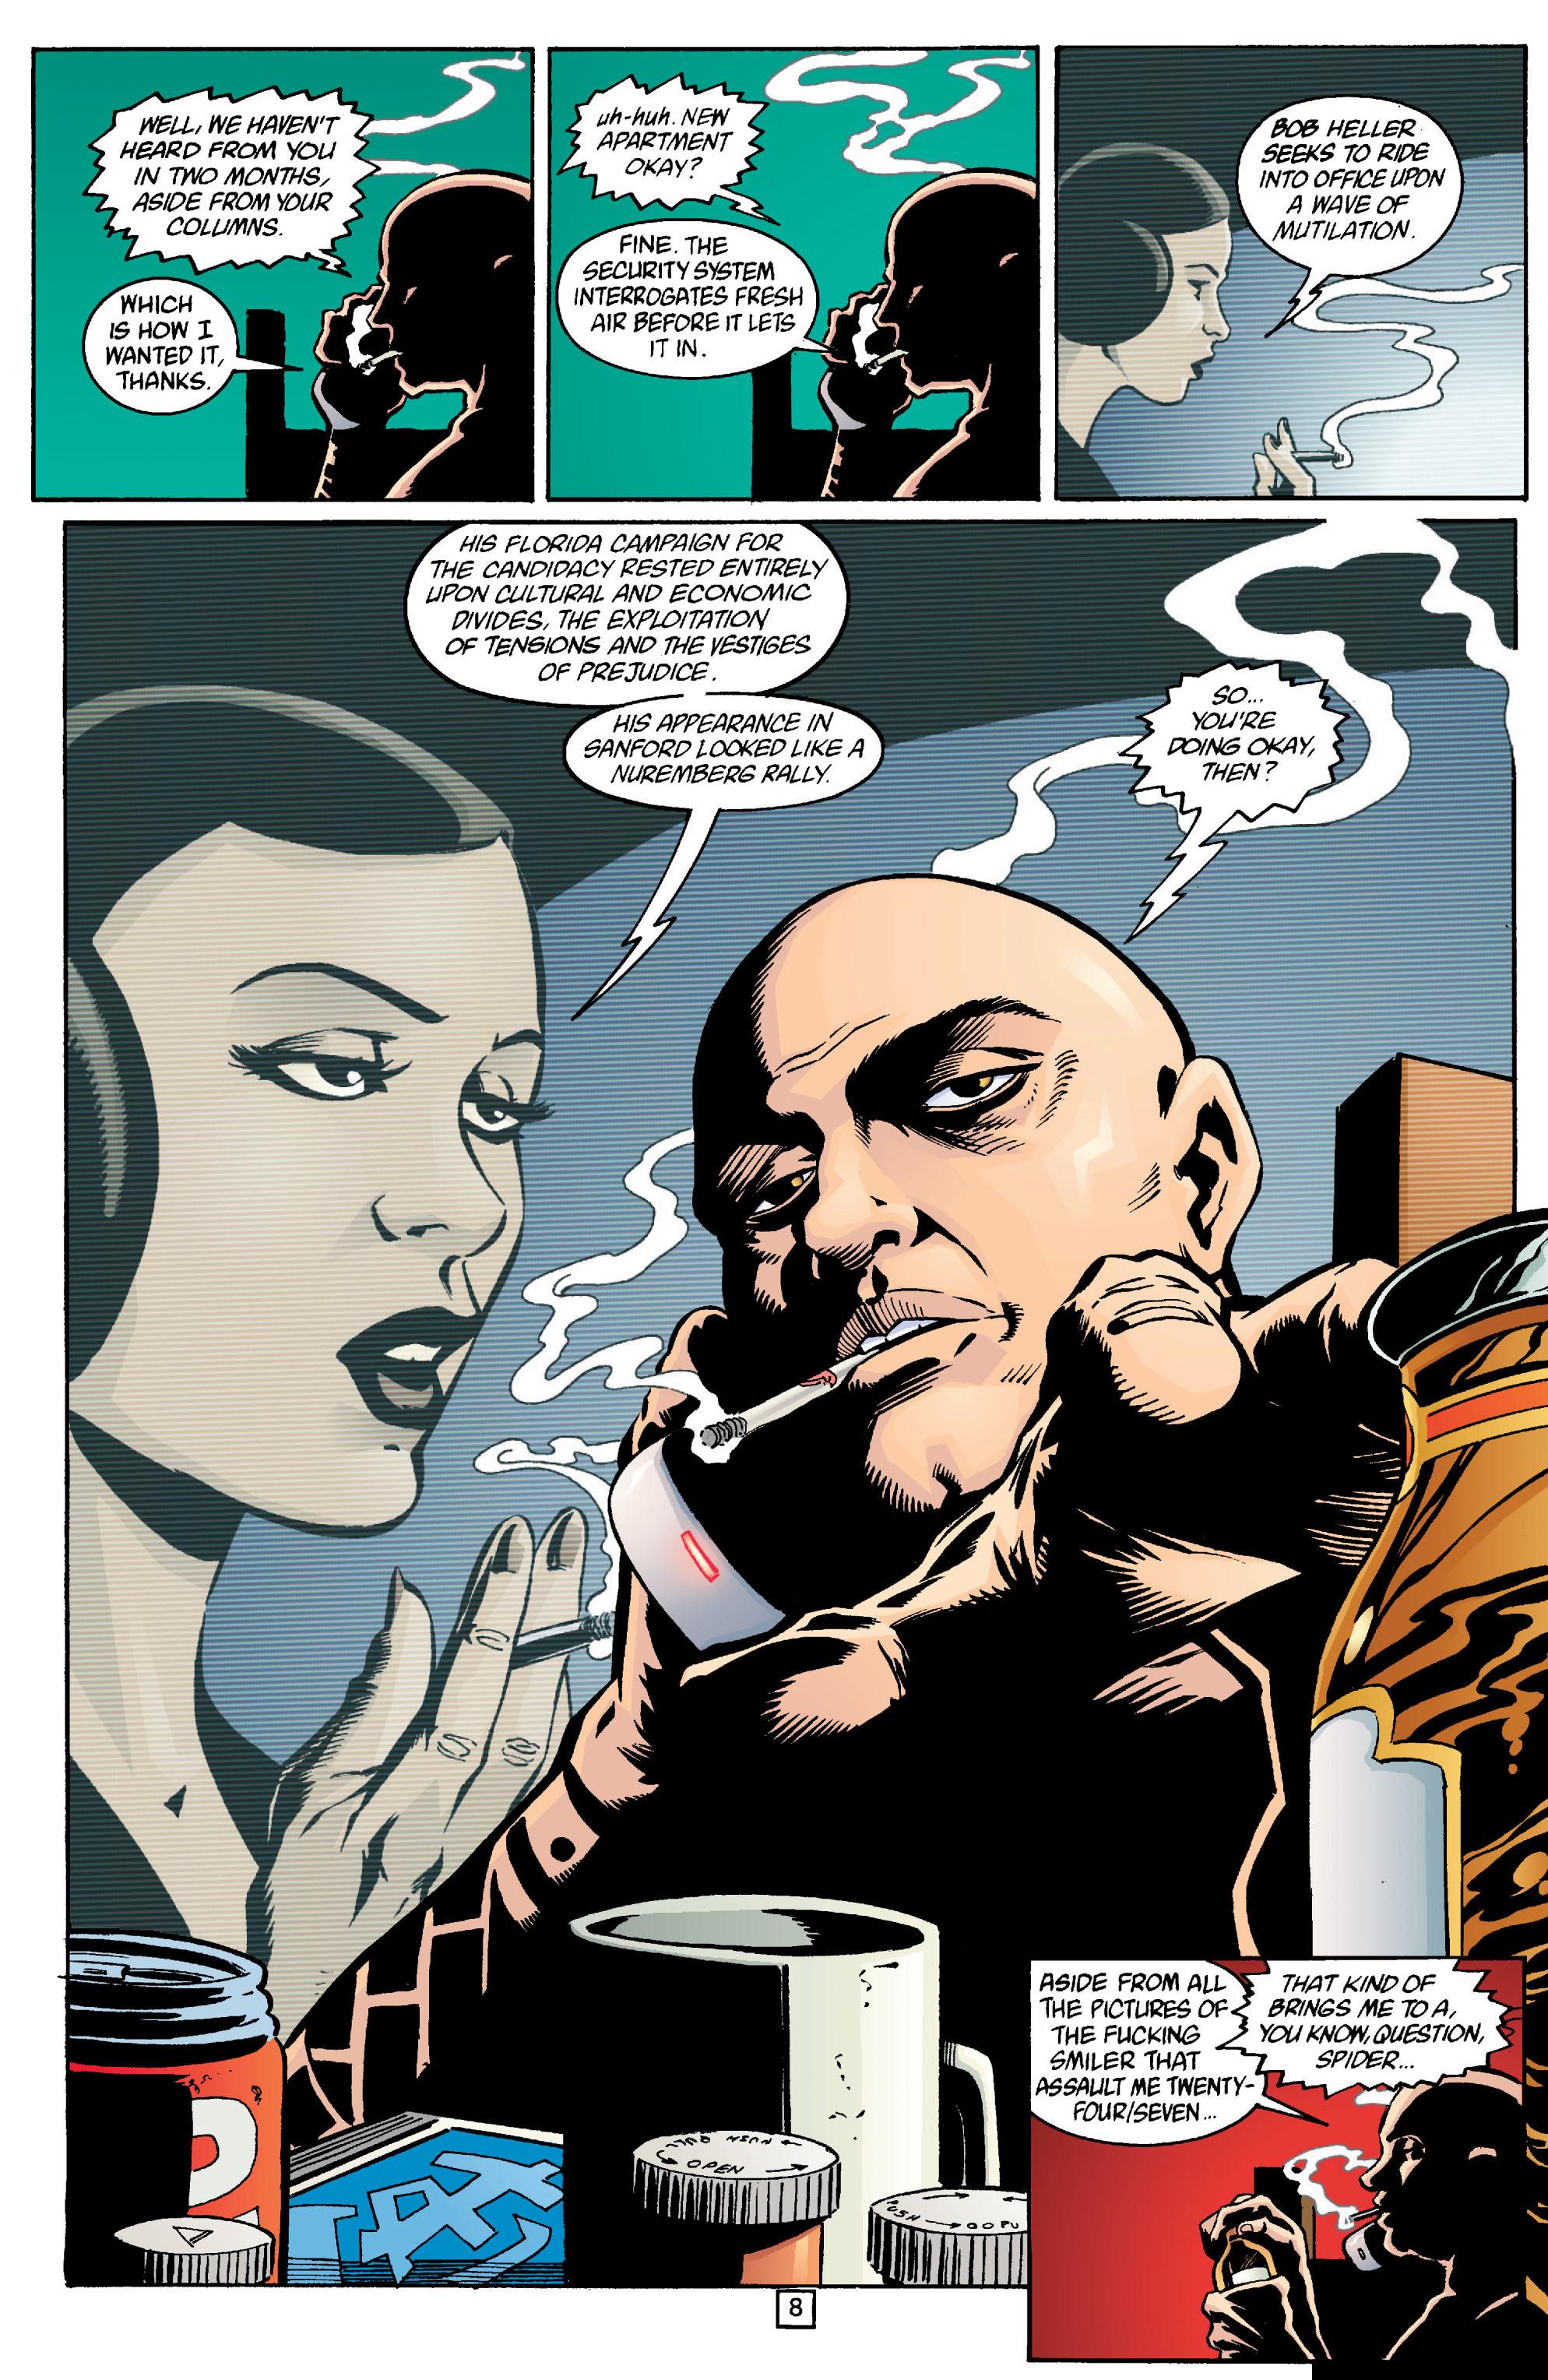 Read online Transmetropolitan comic -  Issue #13 - 9